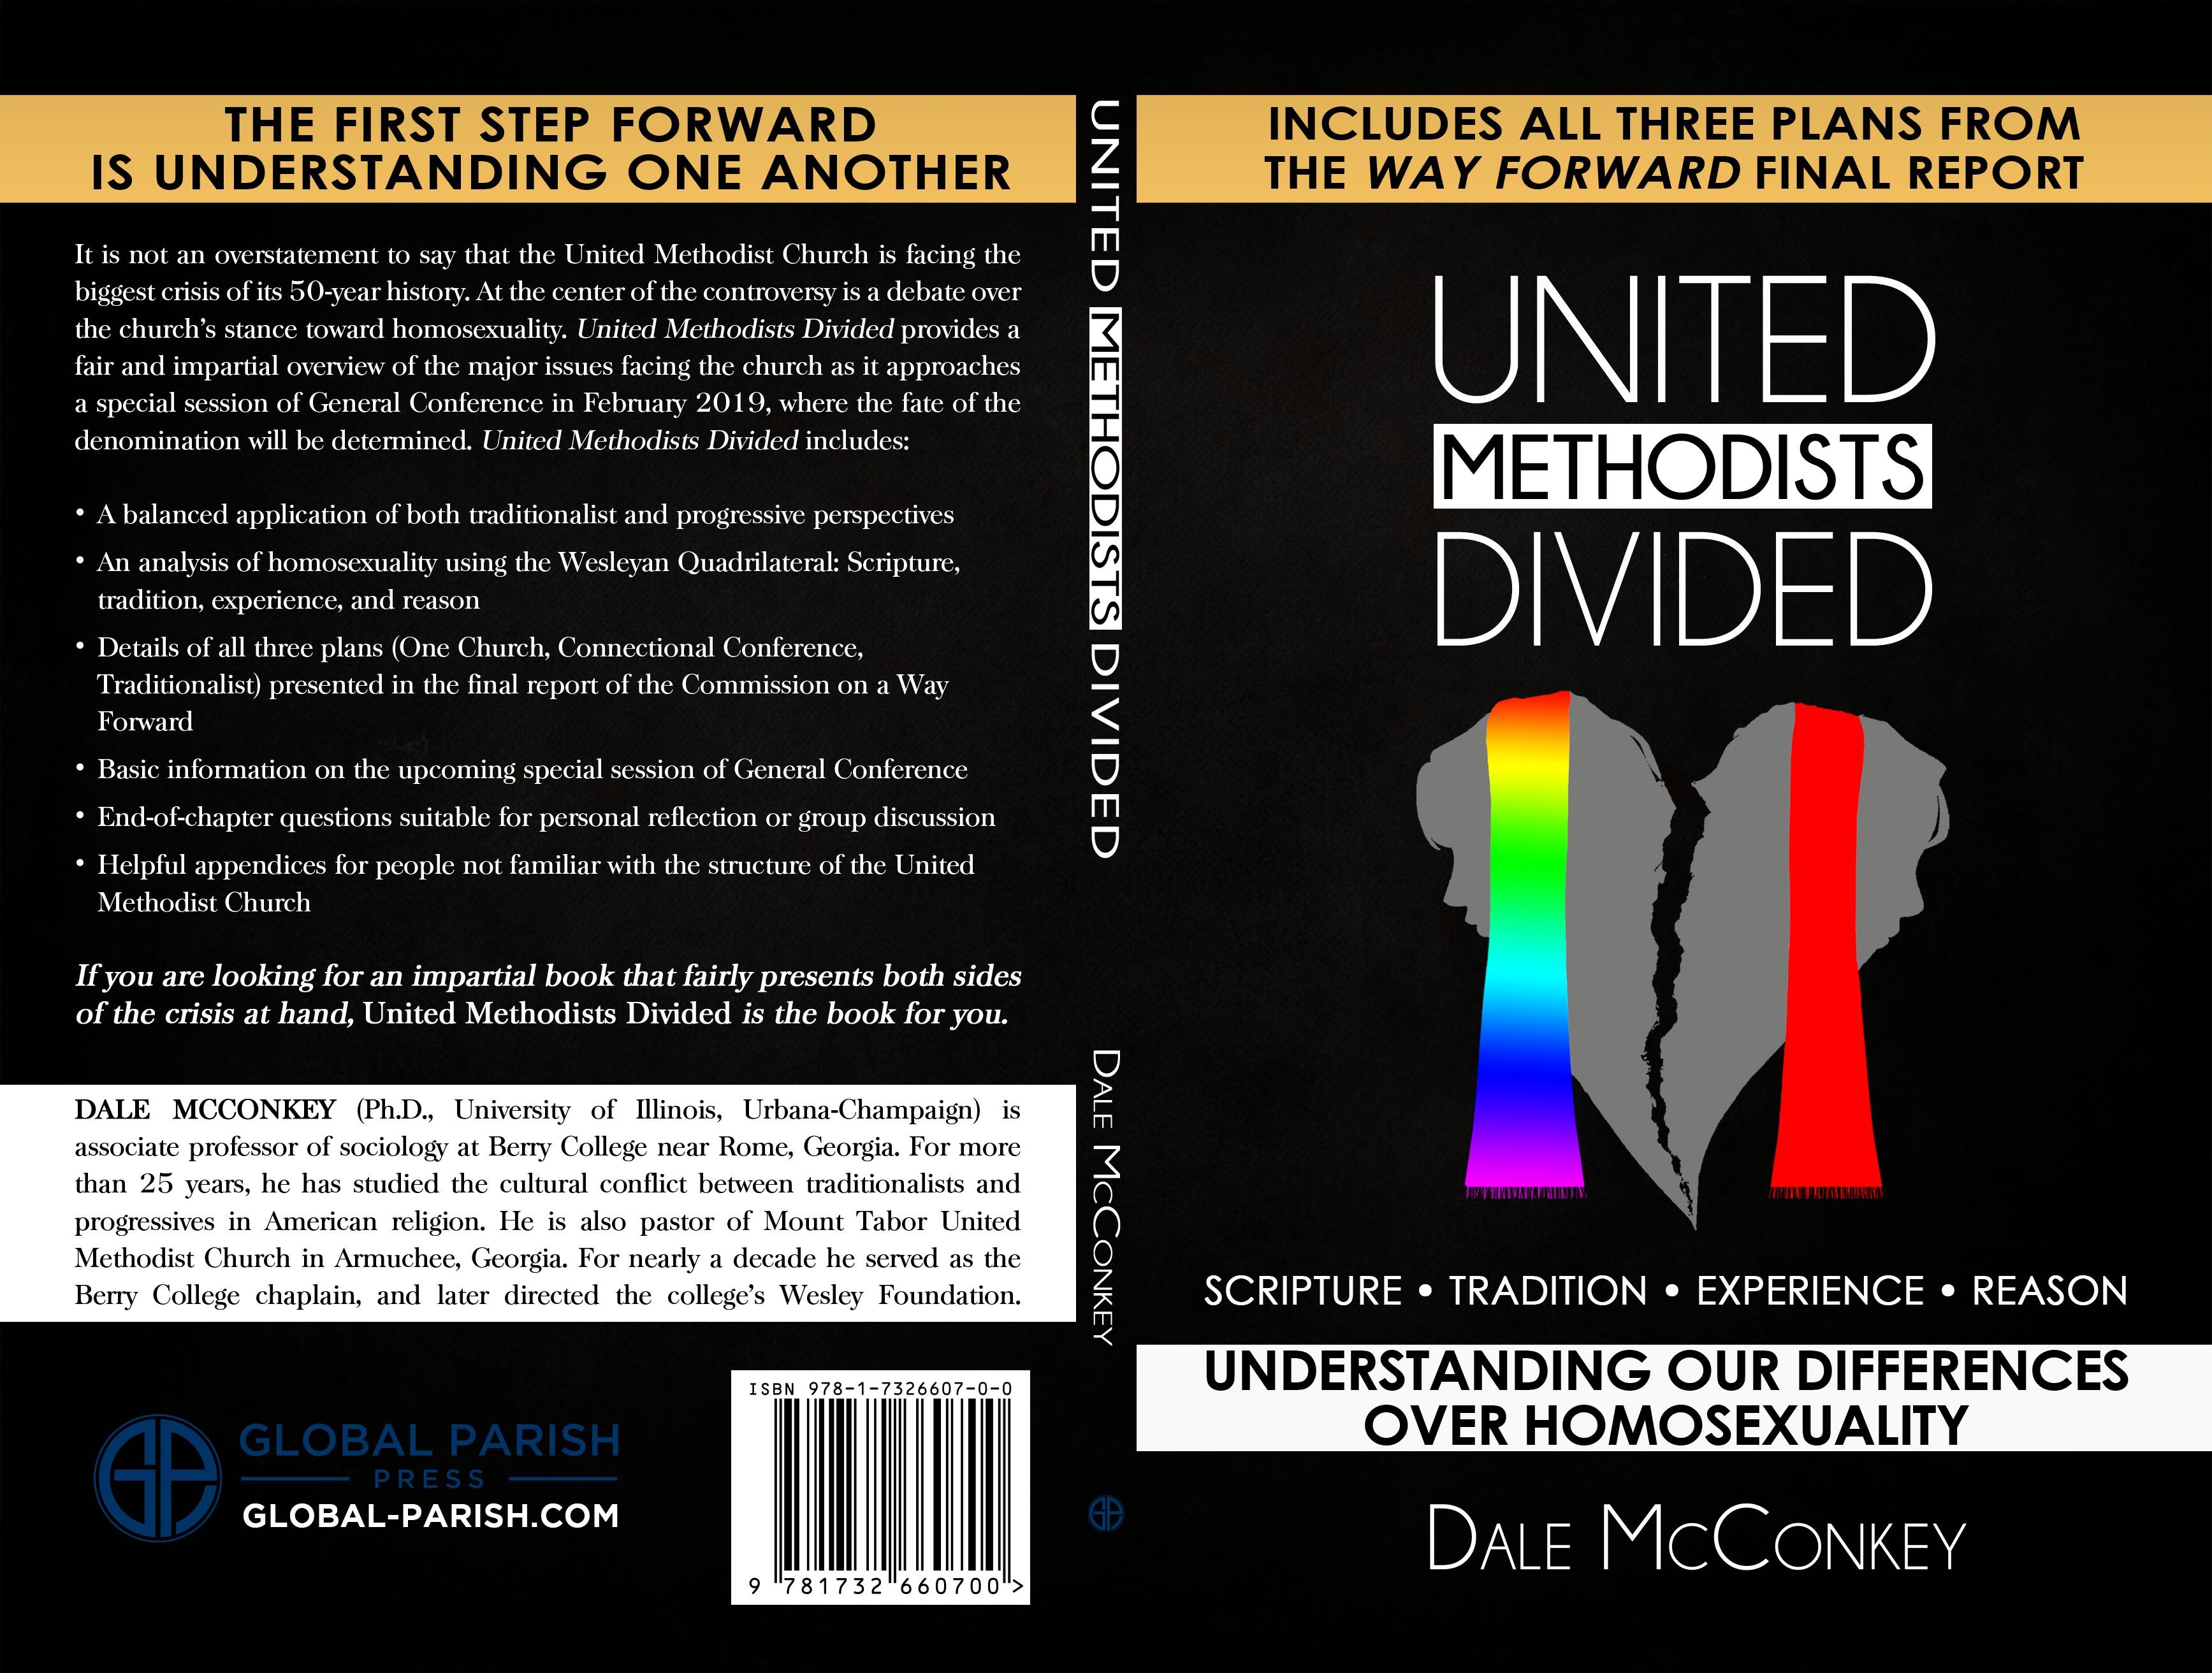 Sleek Book Cover for Homosexuality Debate in Church